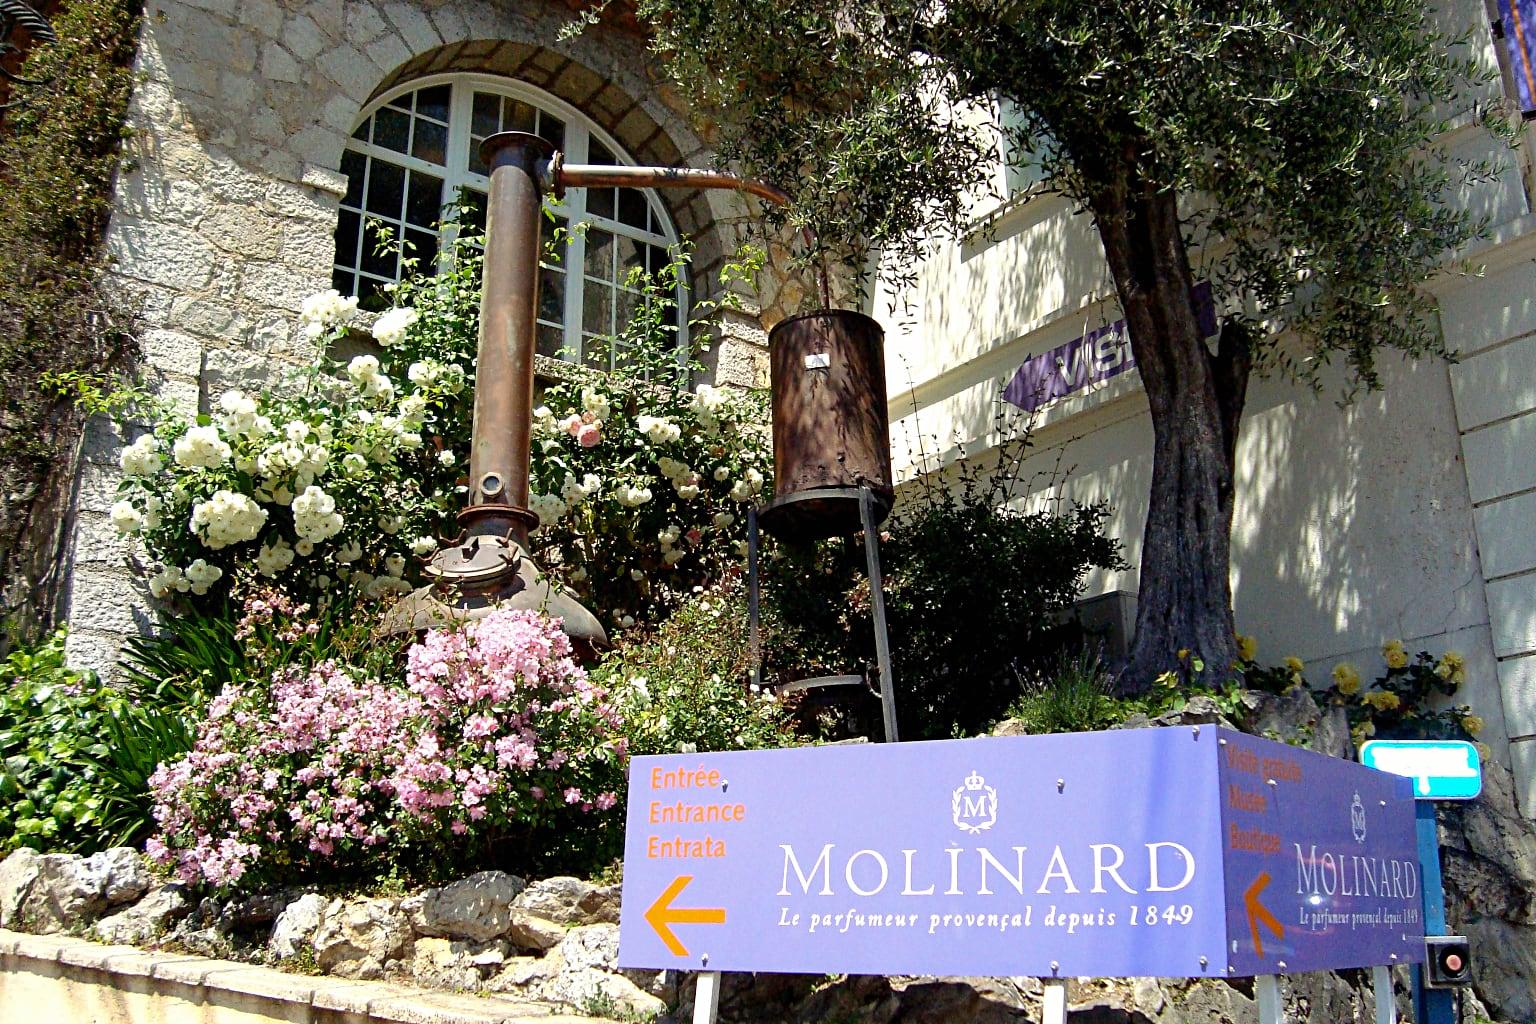 The Molinard Perfumery in Grasse, Provence